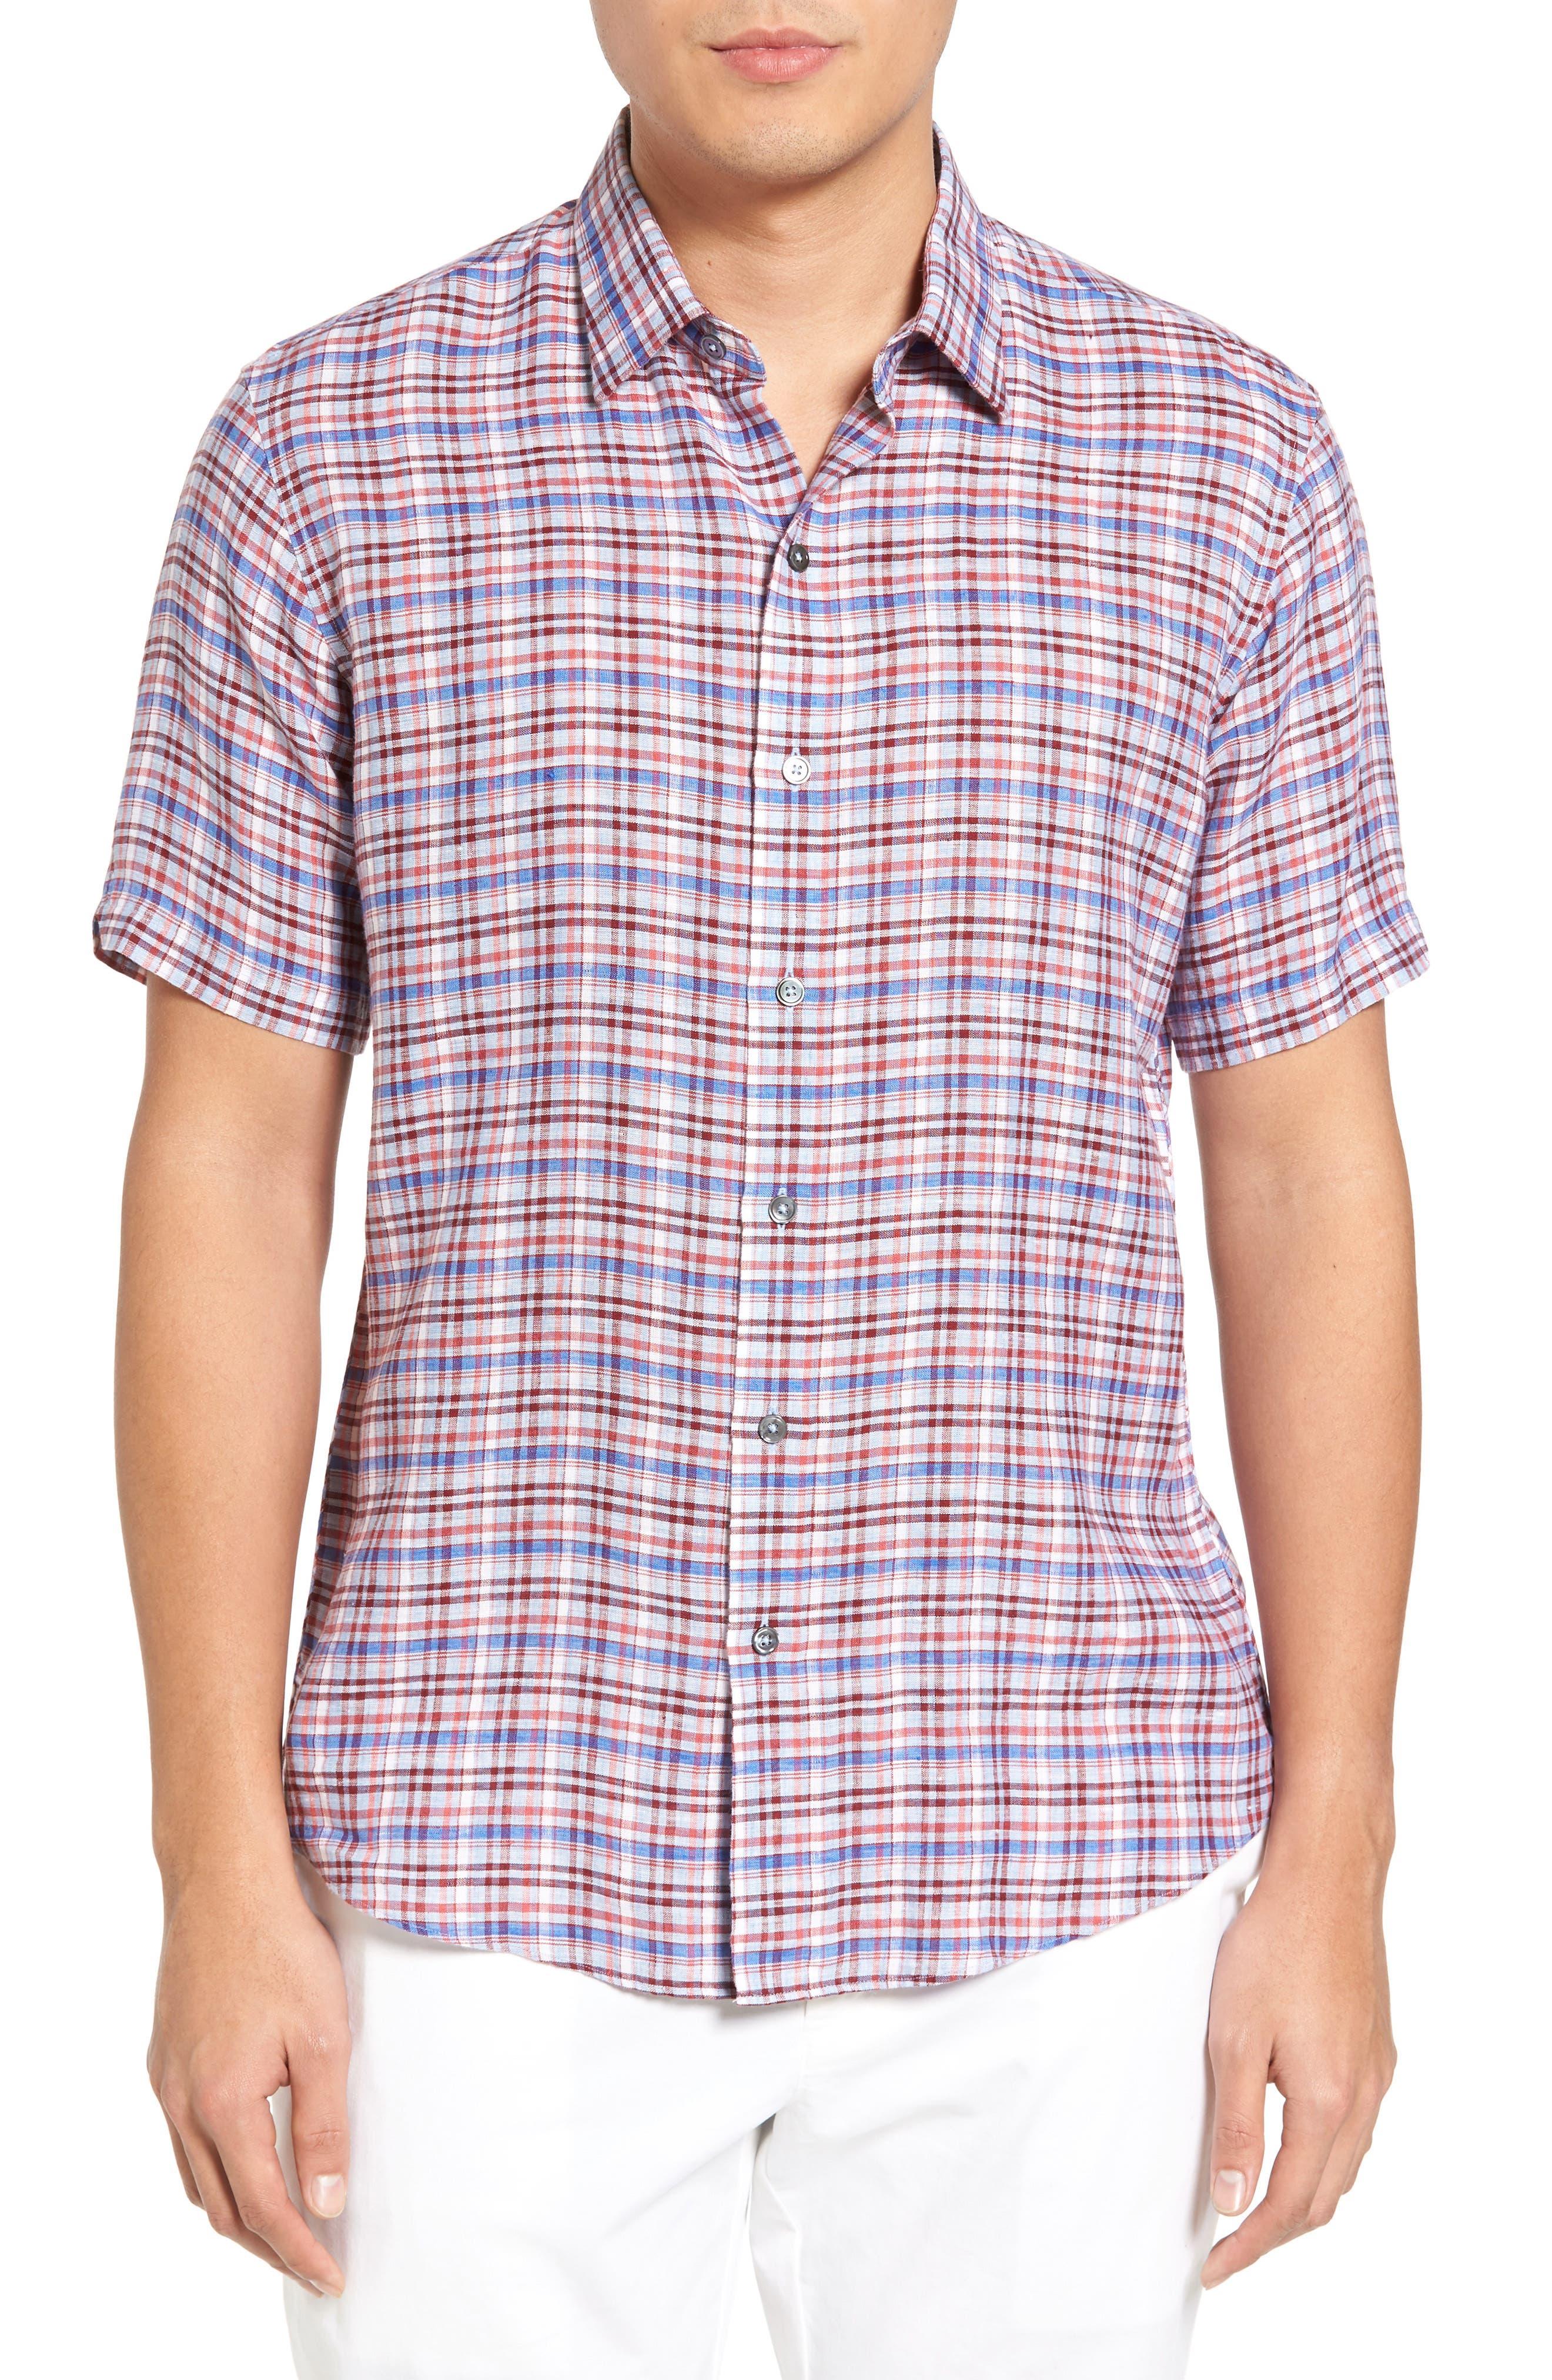 Main Image - Zachary Prell Bean Trim Fit Plaid Linen Sport Shirt